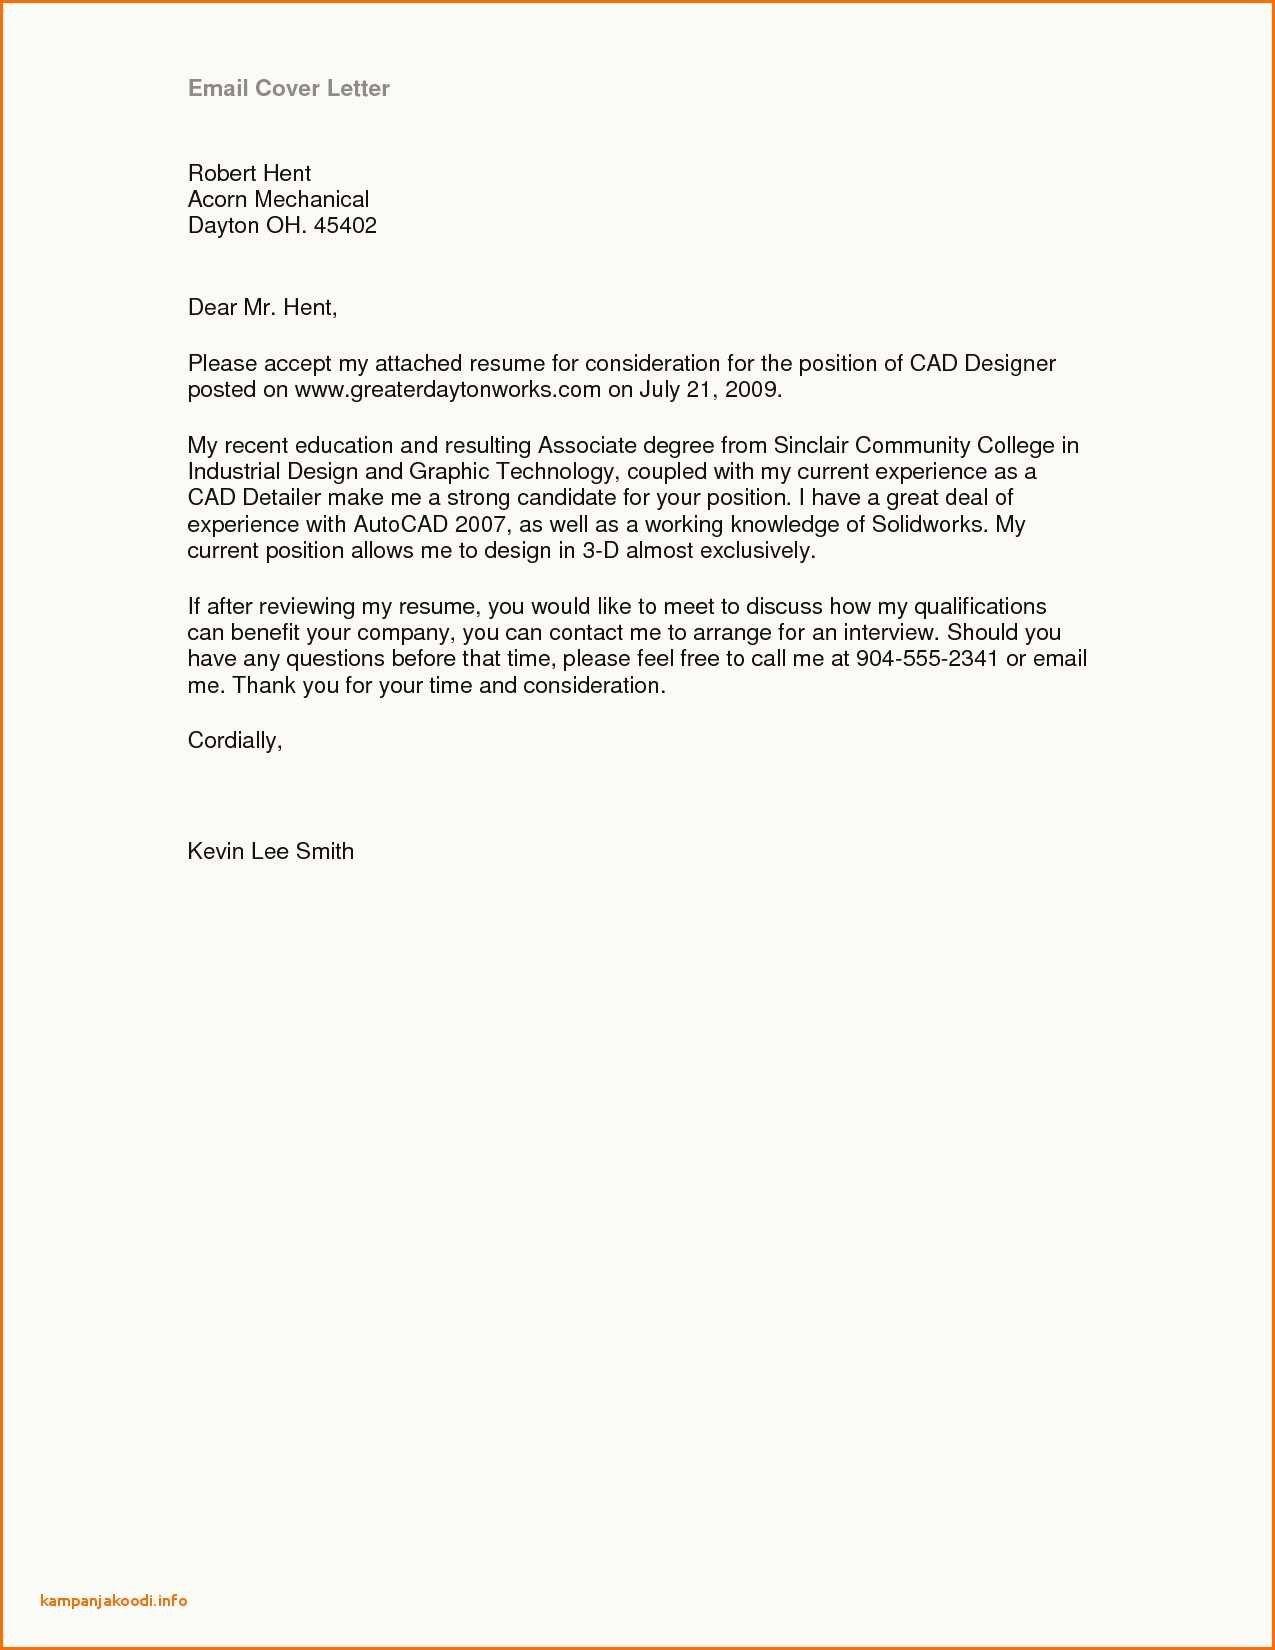 Cover Letter Email Resume Sample